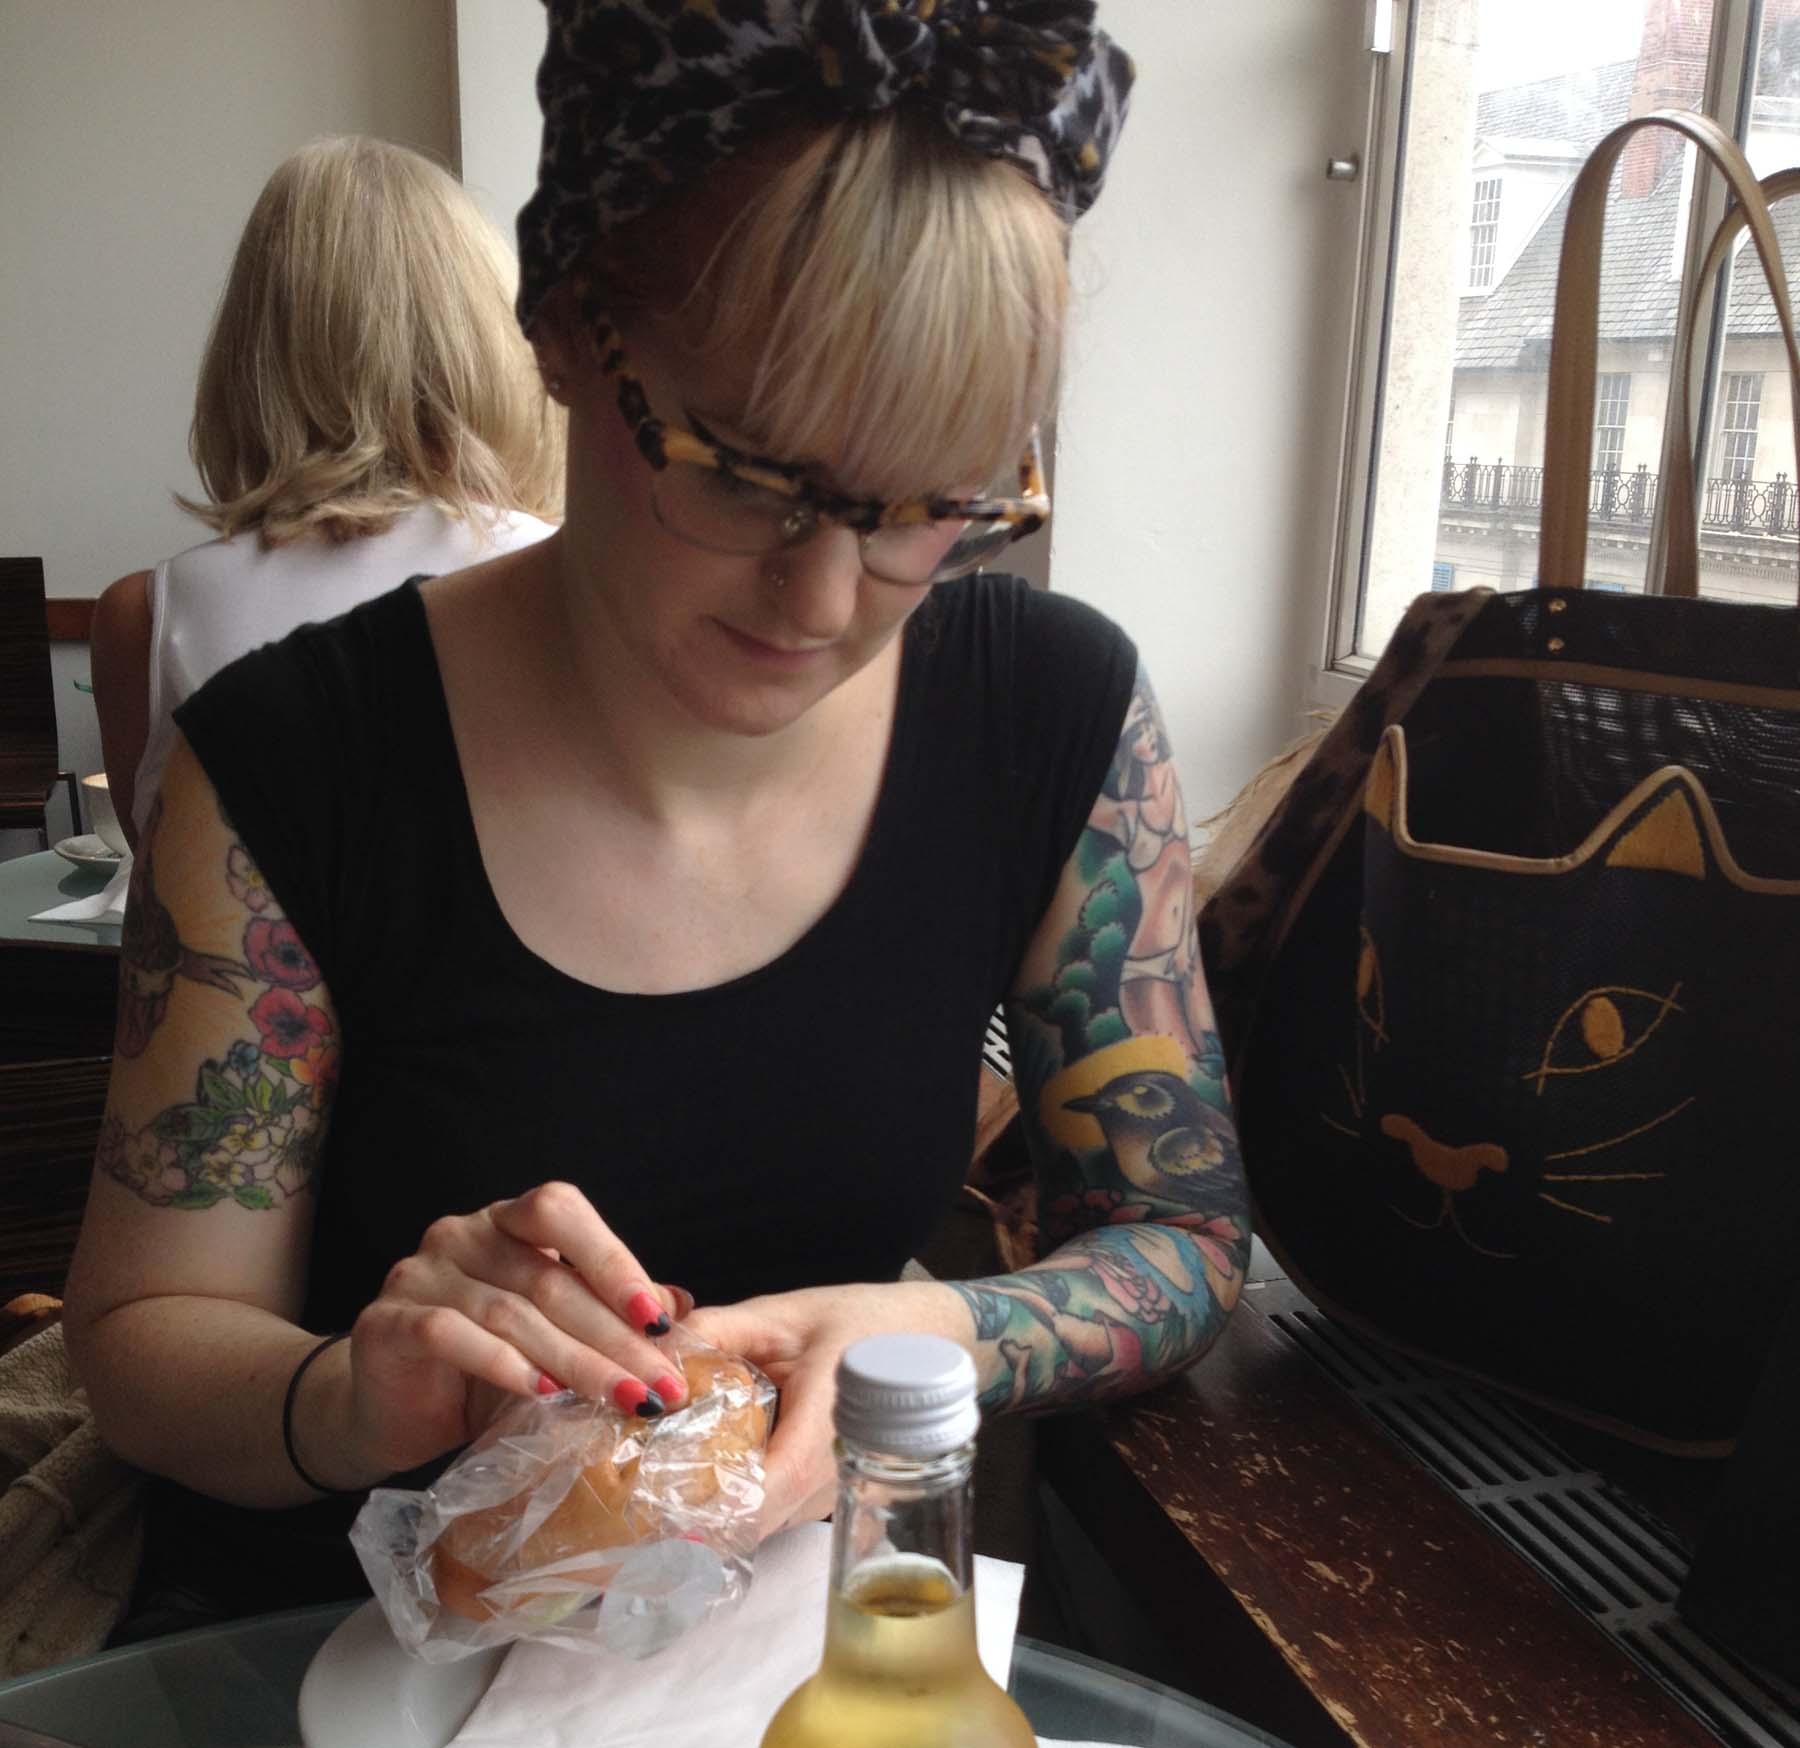 Helen eating lunch in John Lewis